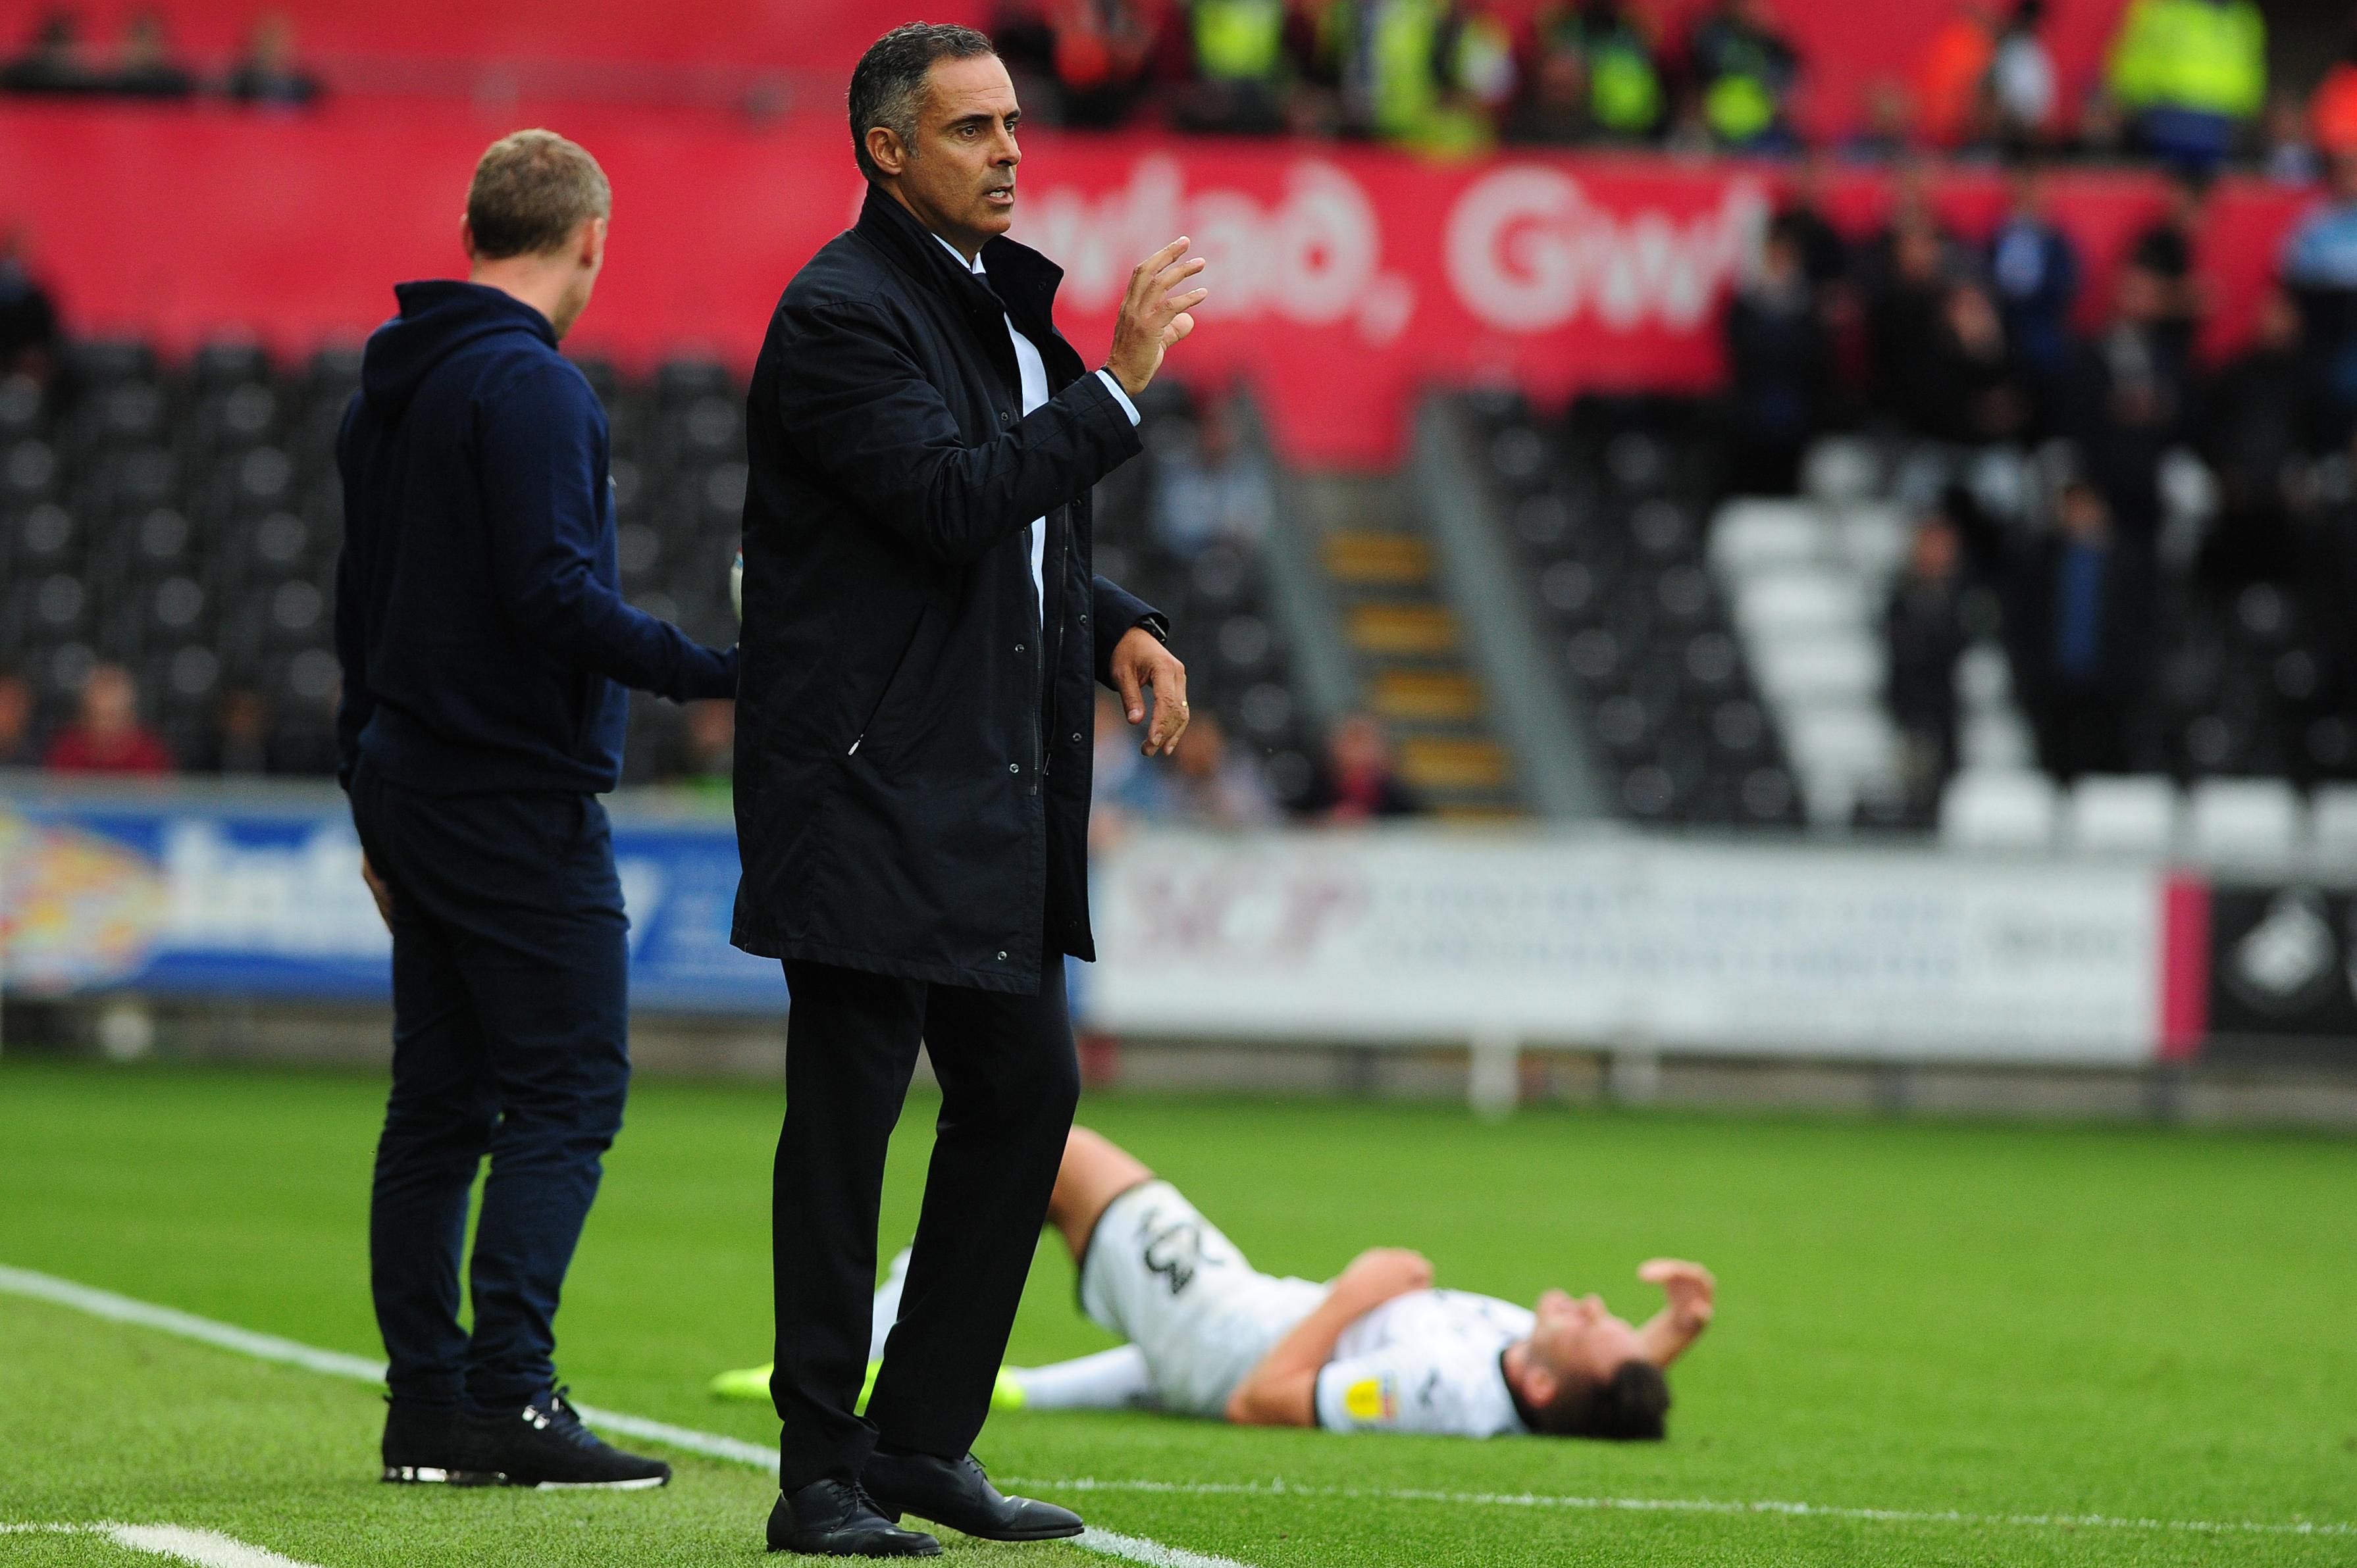 Swansea City v Reading - Sky Bet Championship